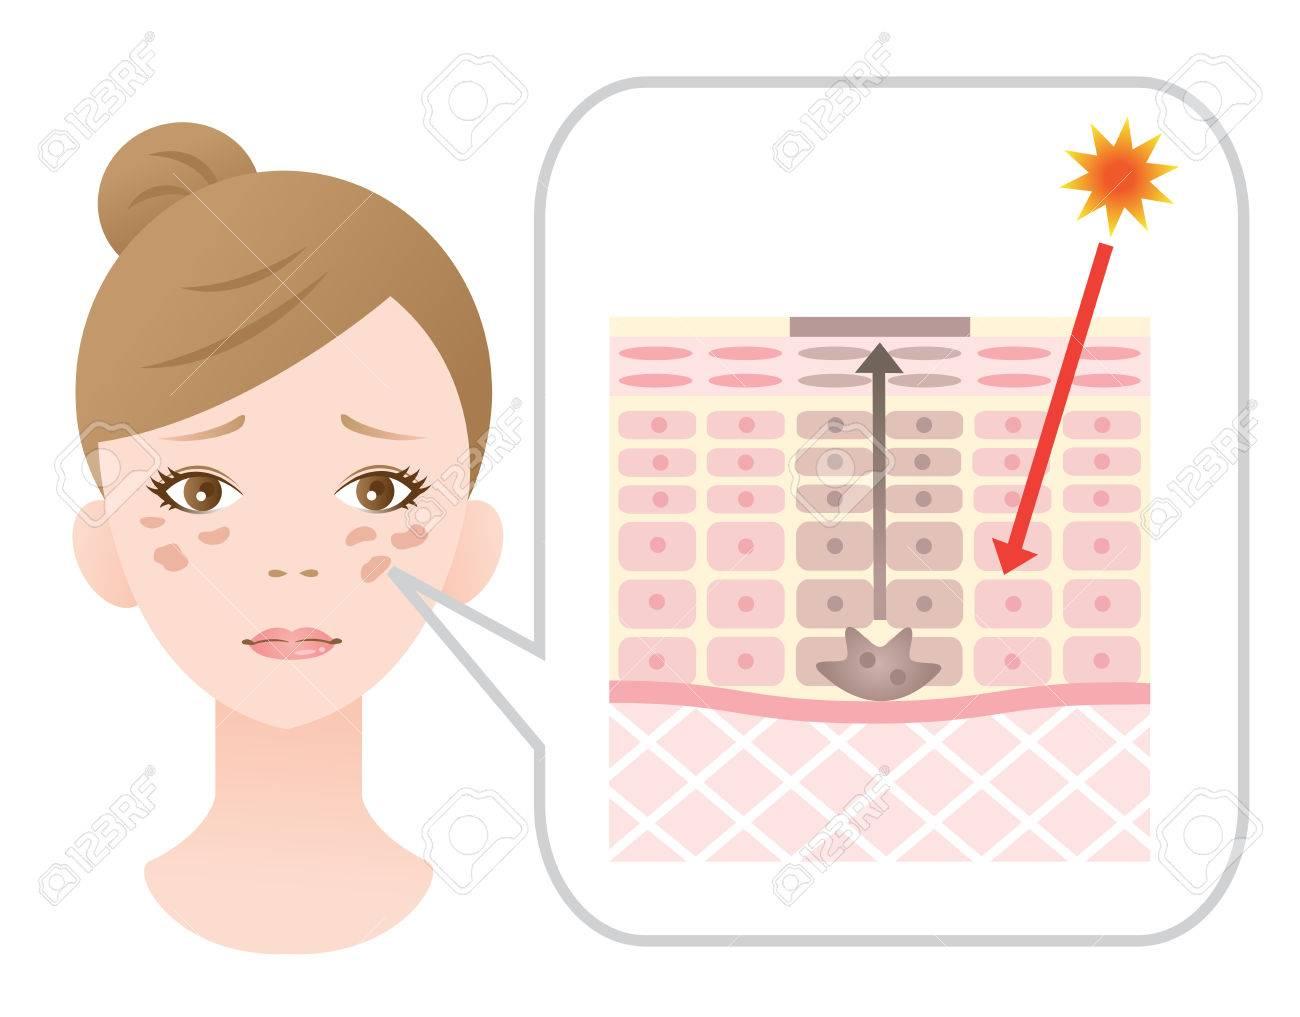 facial blotches and skin mechanism - 57629221